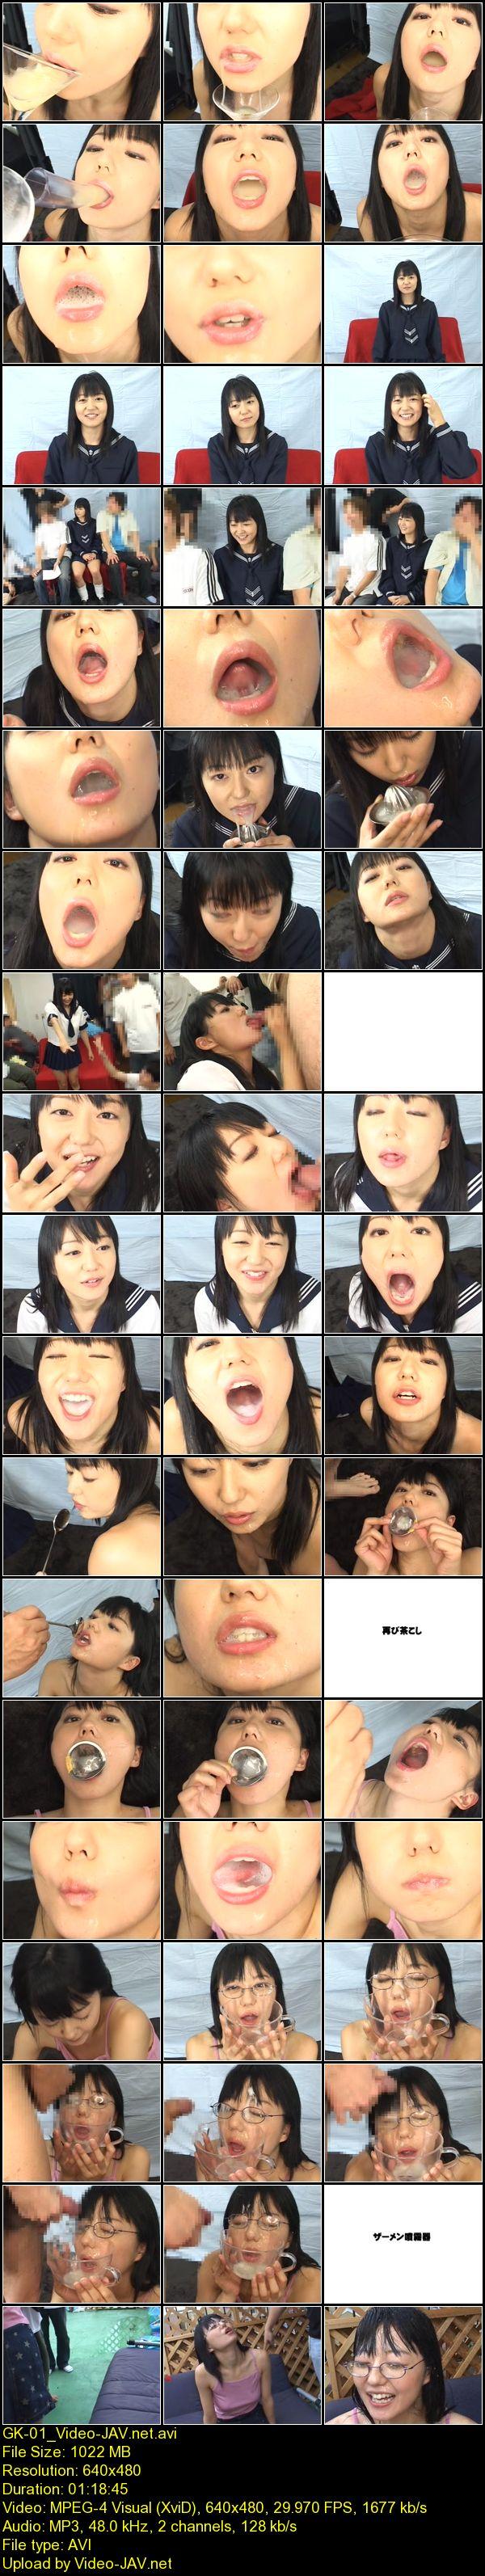 JAV Download Anri Mizuna [GK 01] みずなあんりのごっくんとらいある 1 フェラ・手コキ ミルキーキャット 2007 07 01